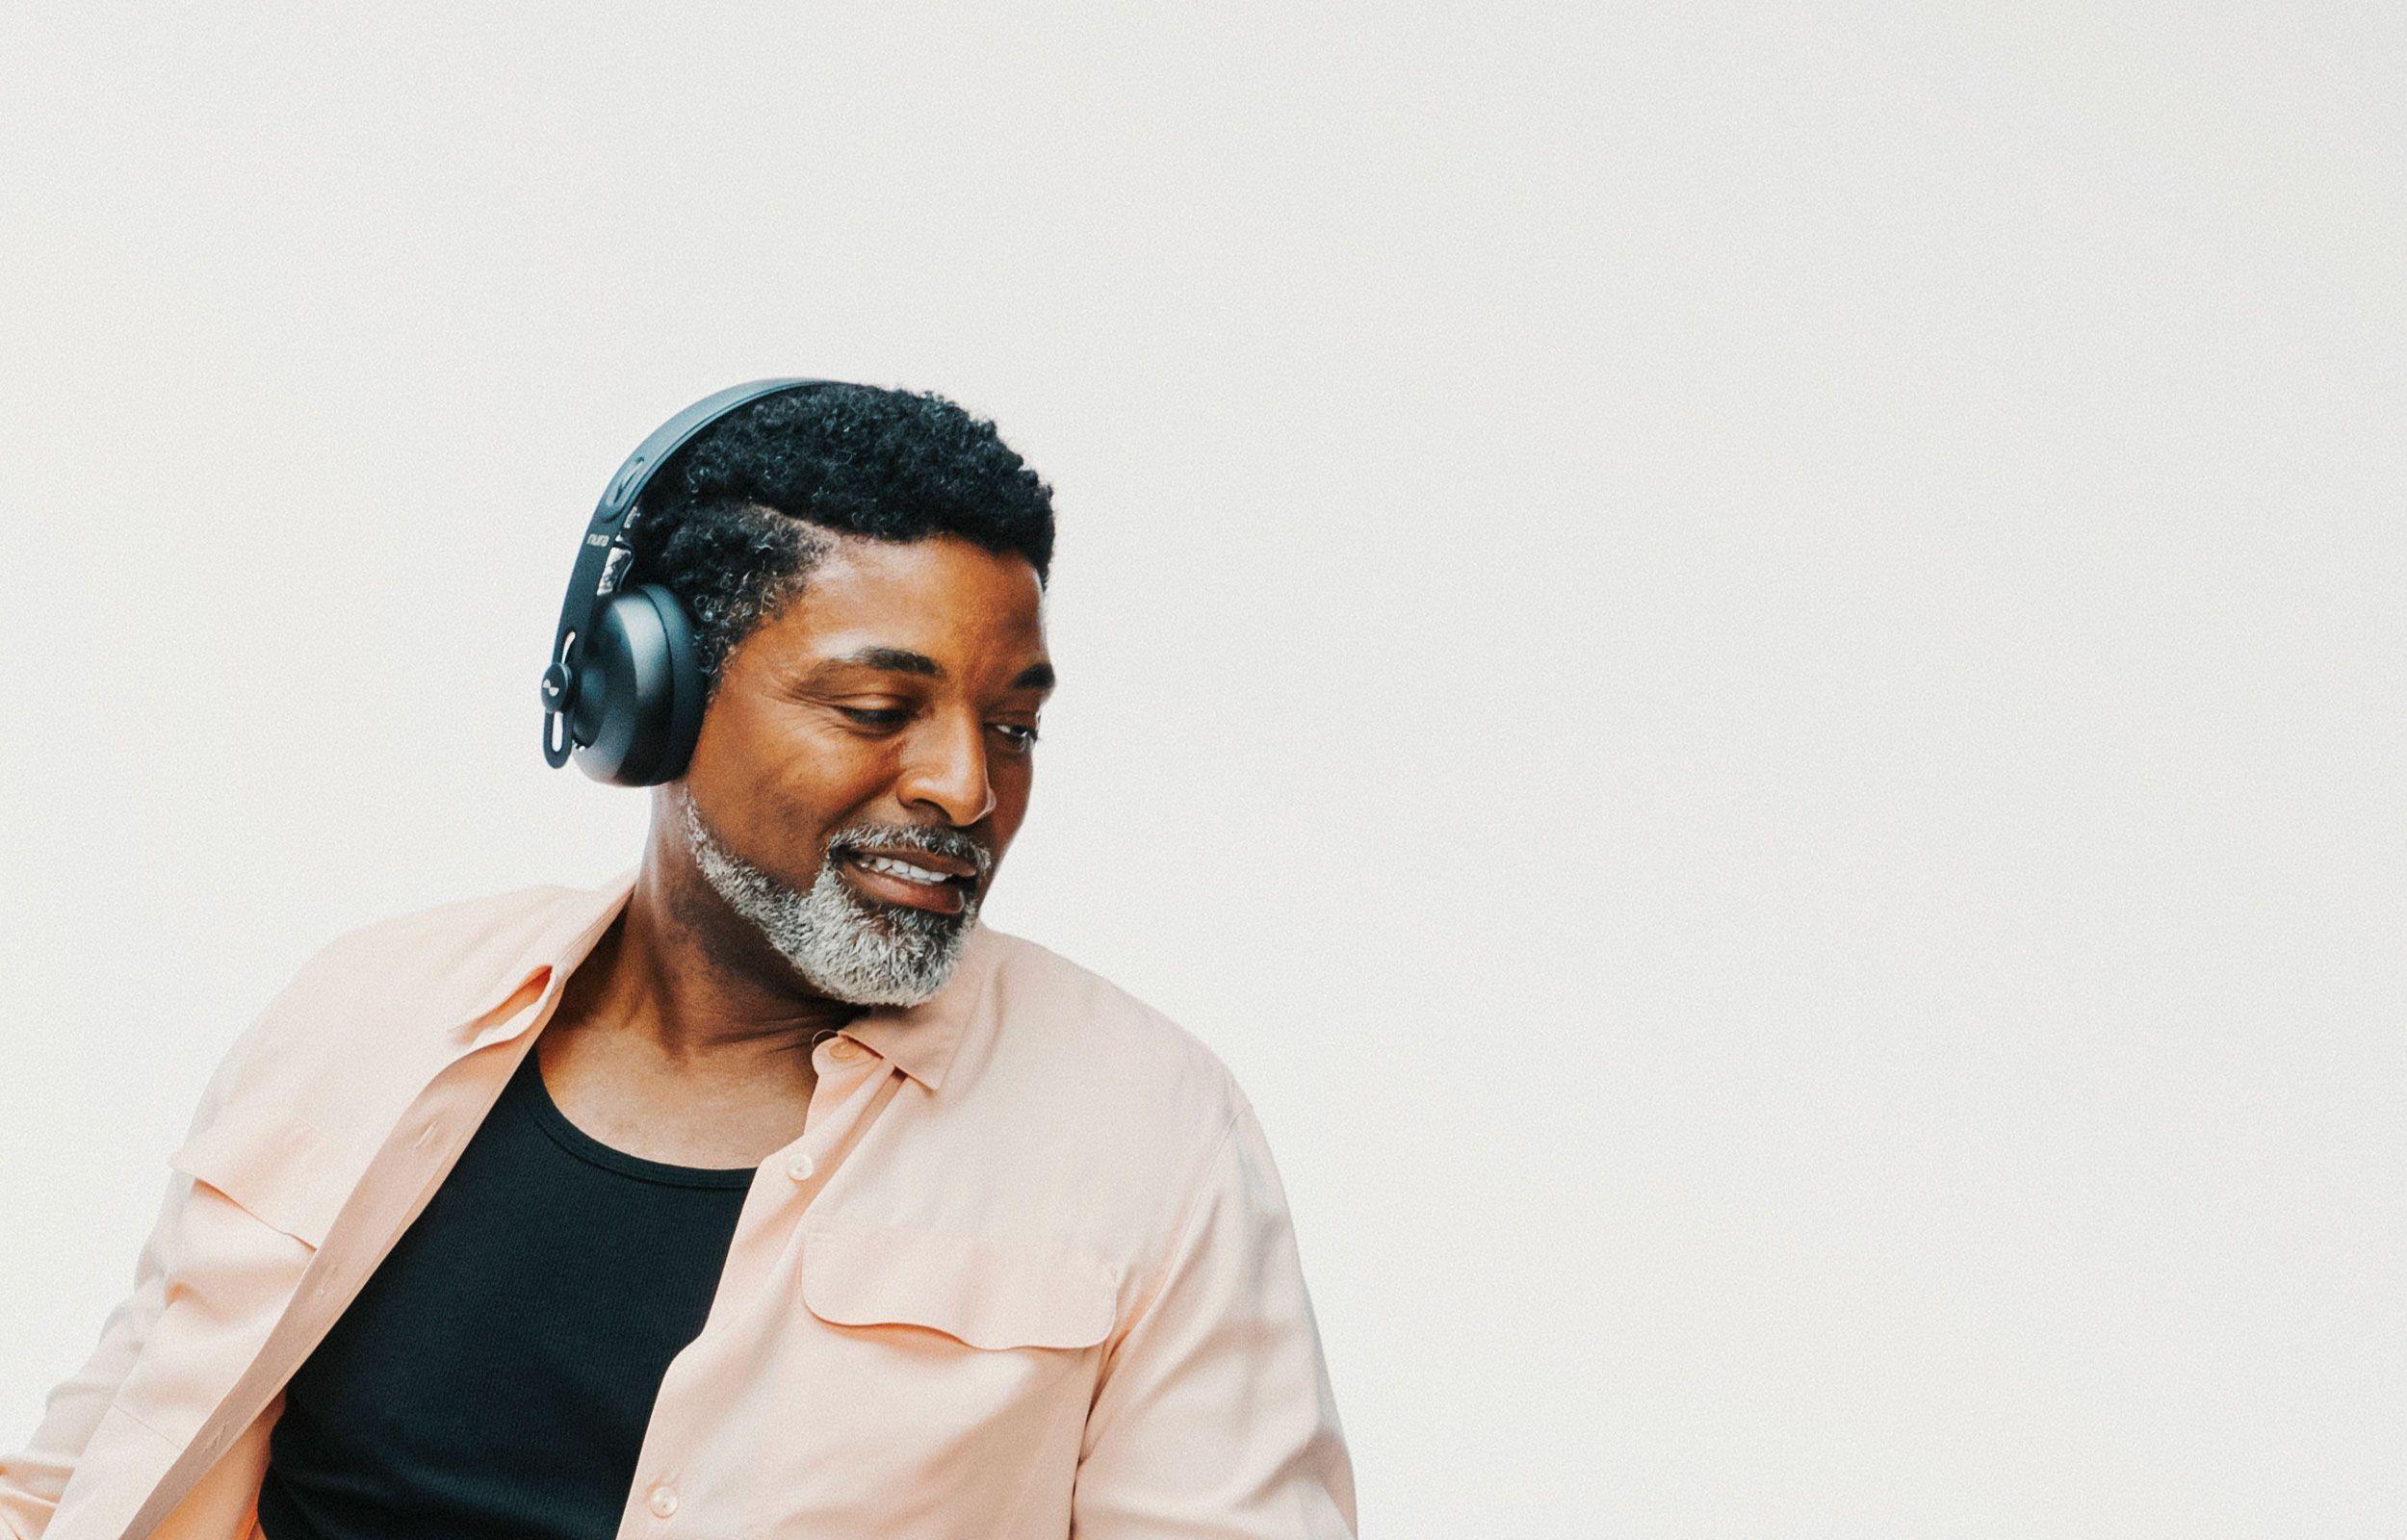 Person dancing with NURAPHONE headphones on ears